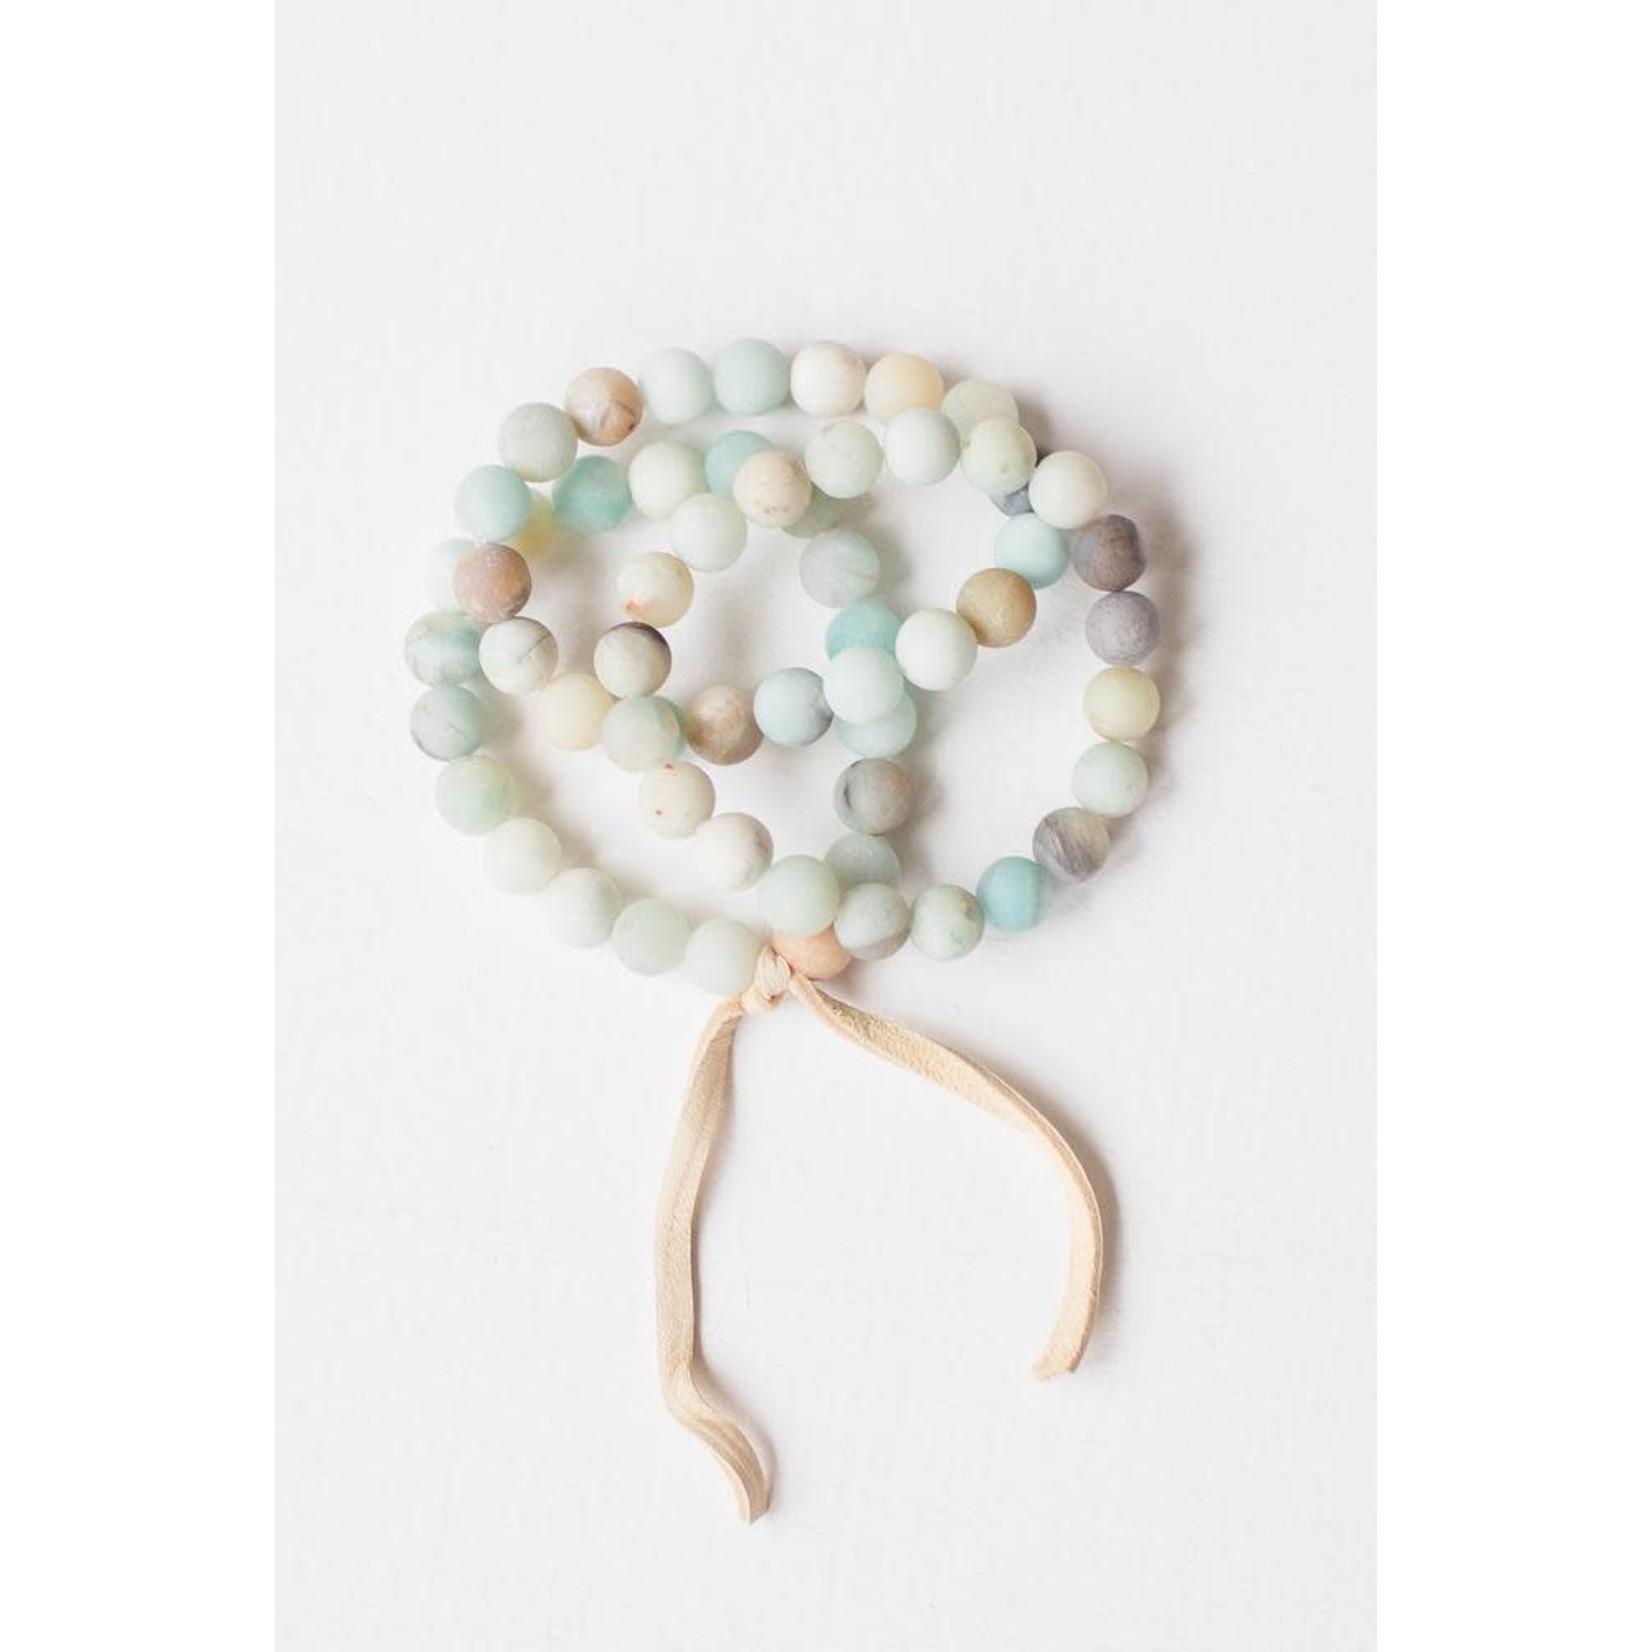 Leslie Curtis Jewelry Designs Mandy Amazonite Bracelet Bundle